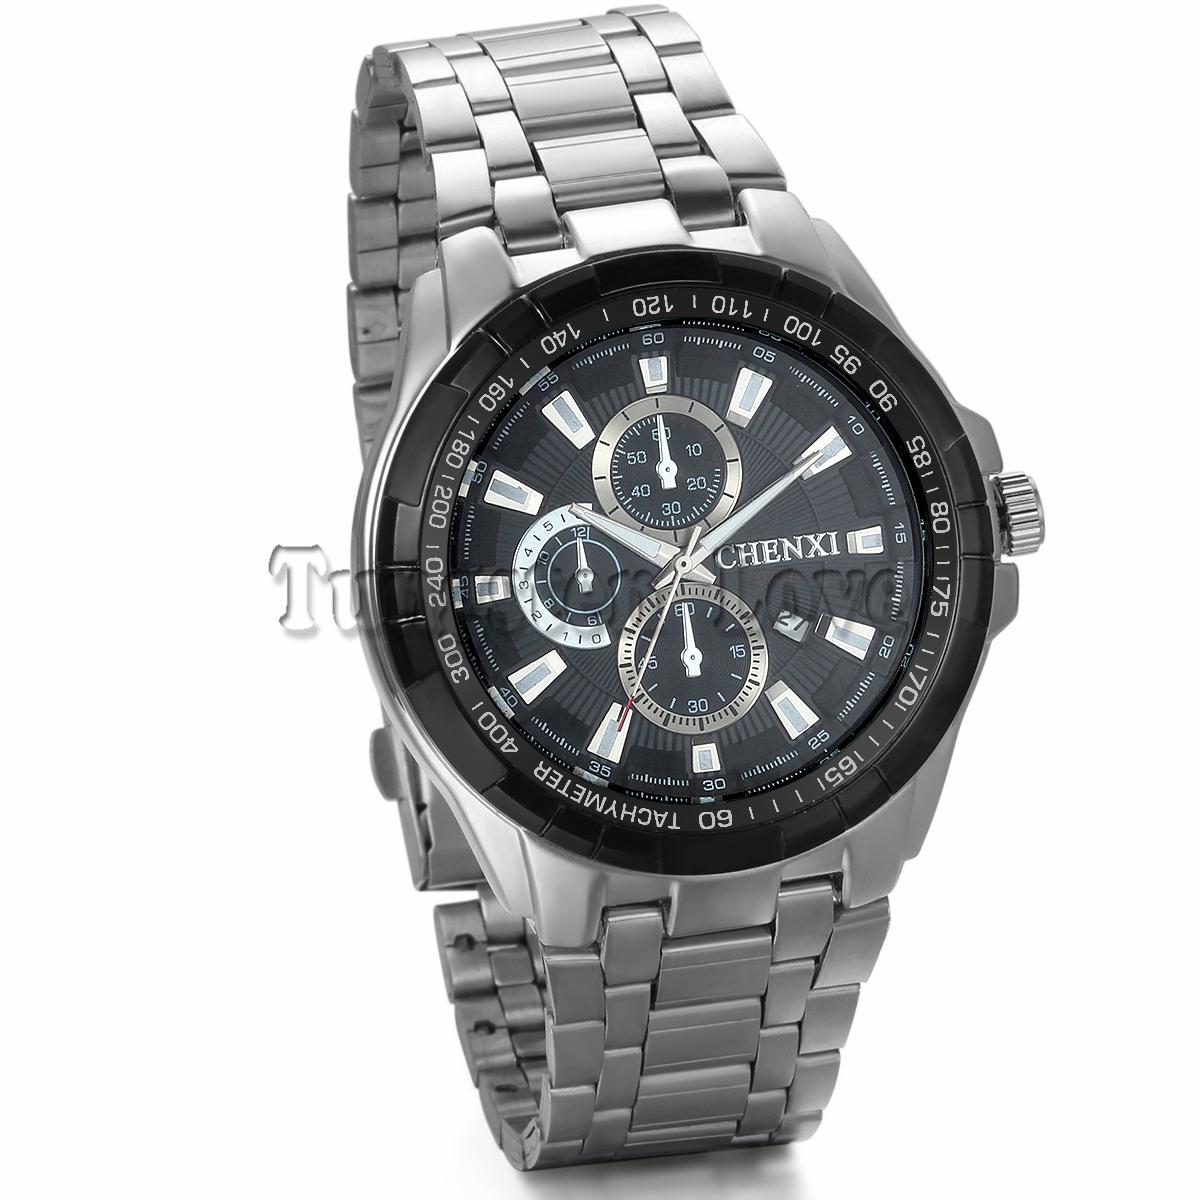 Fashion Auto Date Display Silver Stainless Full Steel Strap Relogio Male Clock Men Wristwatch Quartz Sport Watch(China (Mainland))